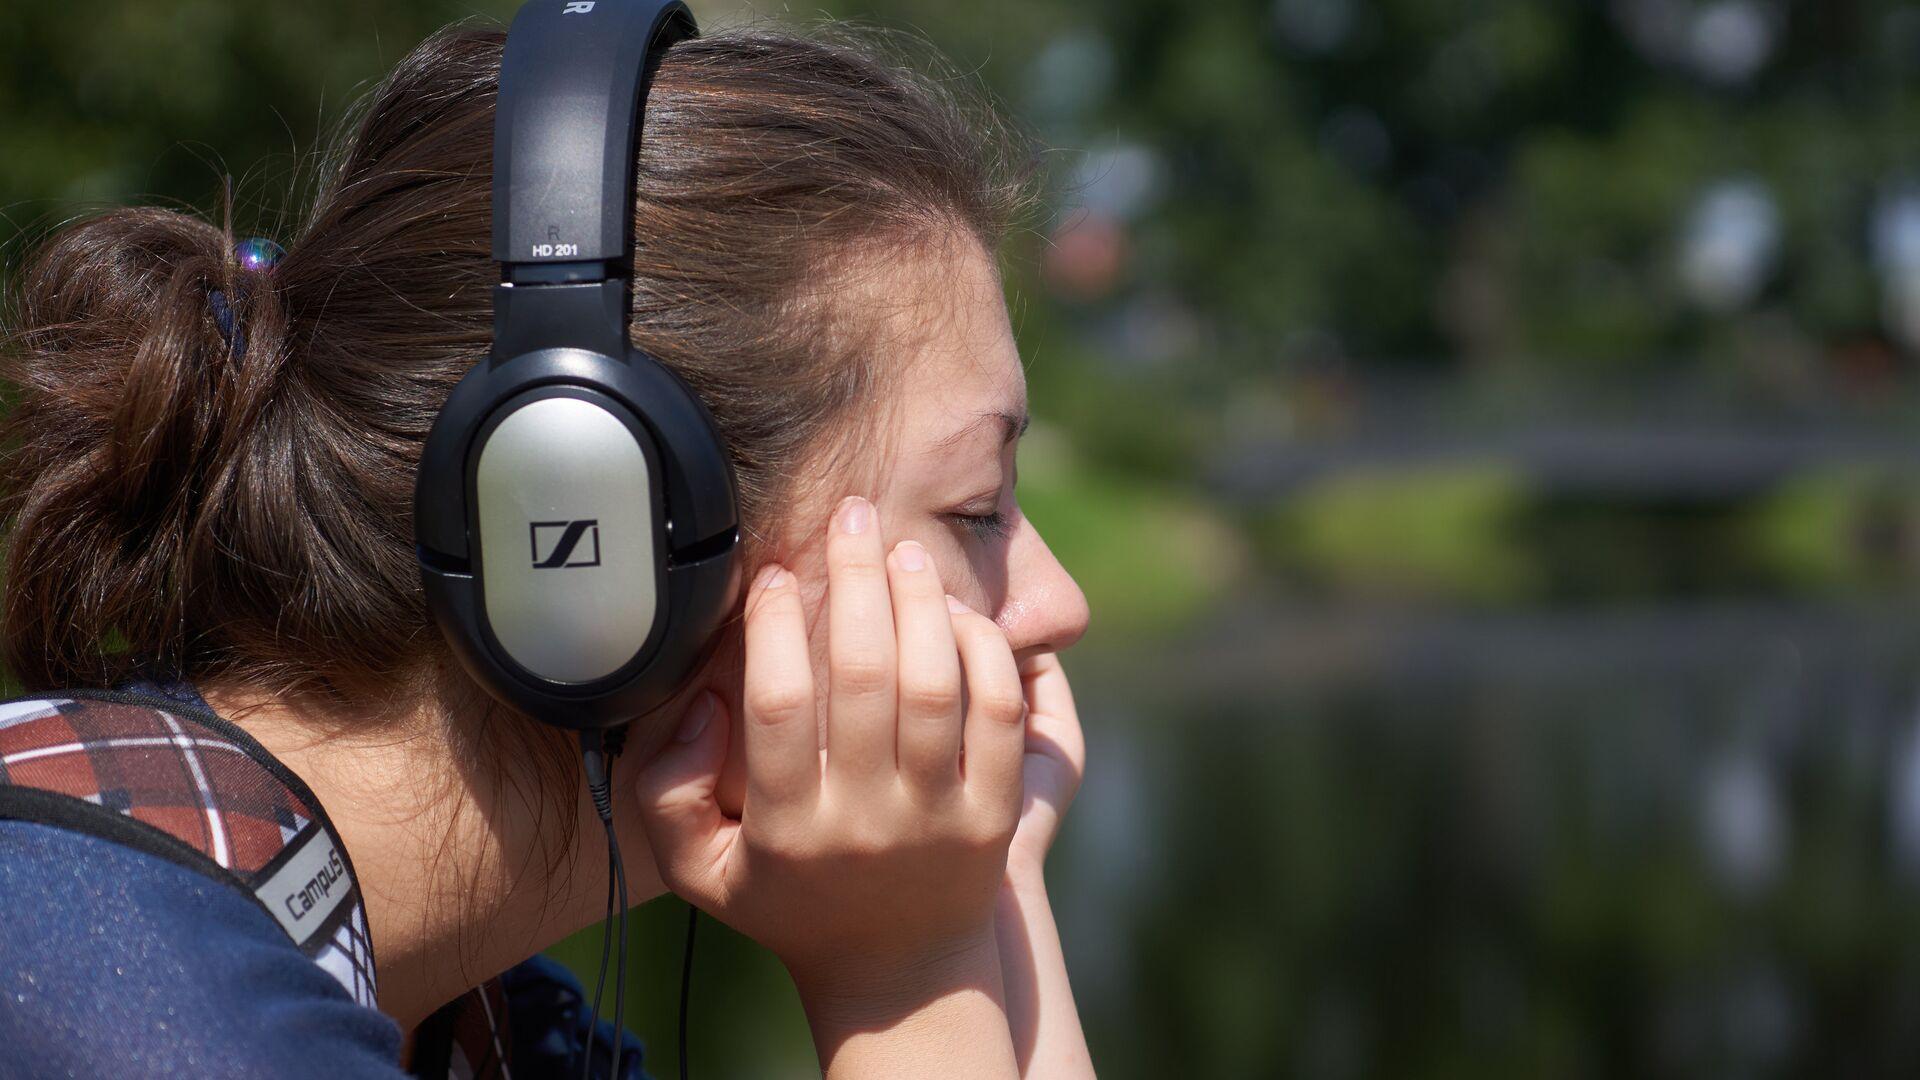 Headphones - Sputnik Mundo, 1920, 13.03.2021